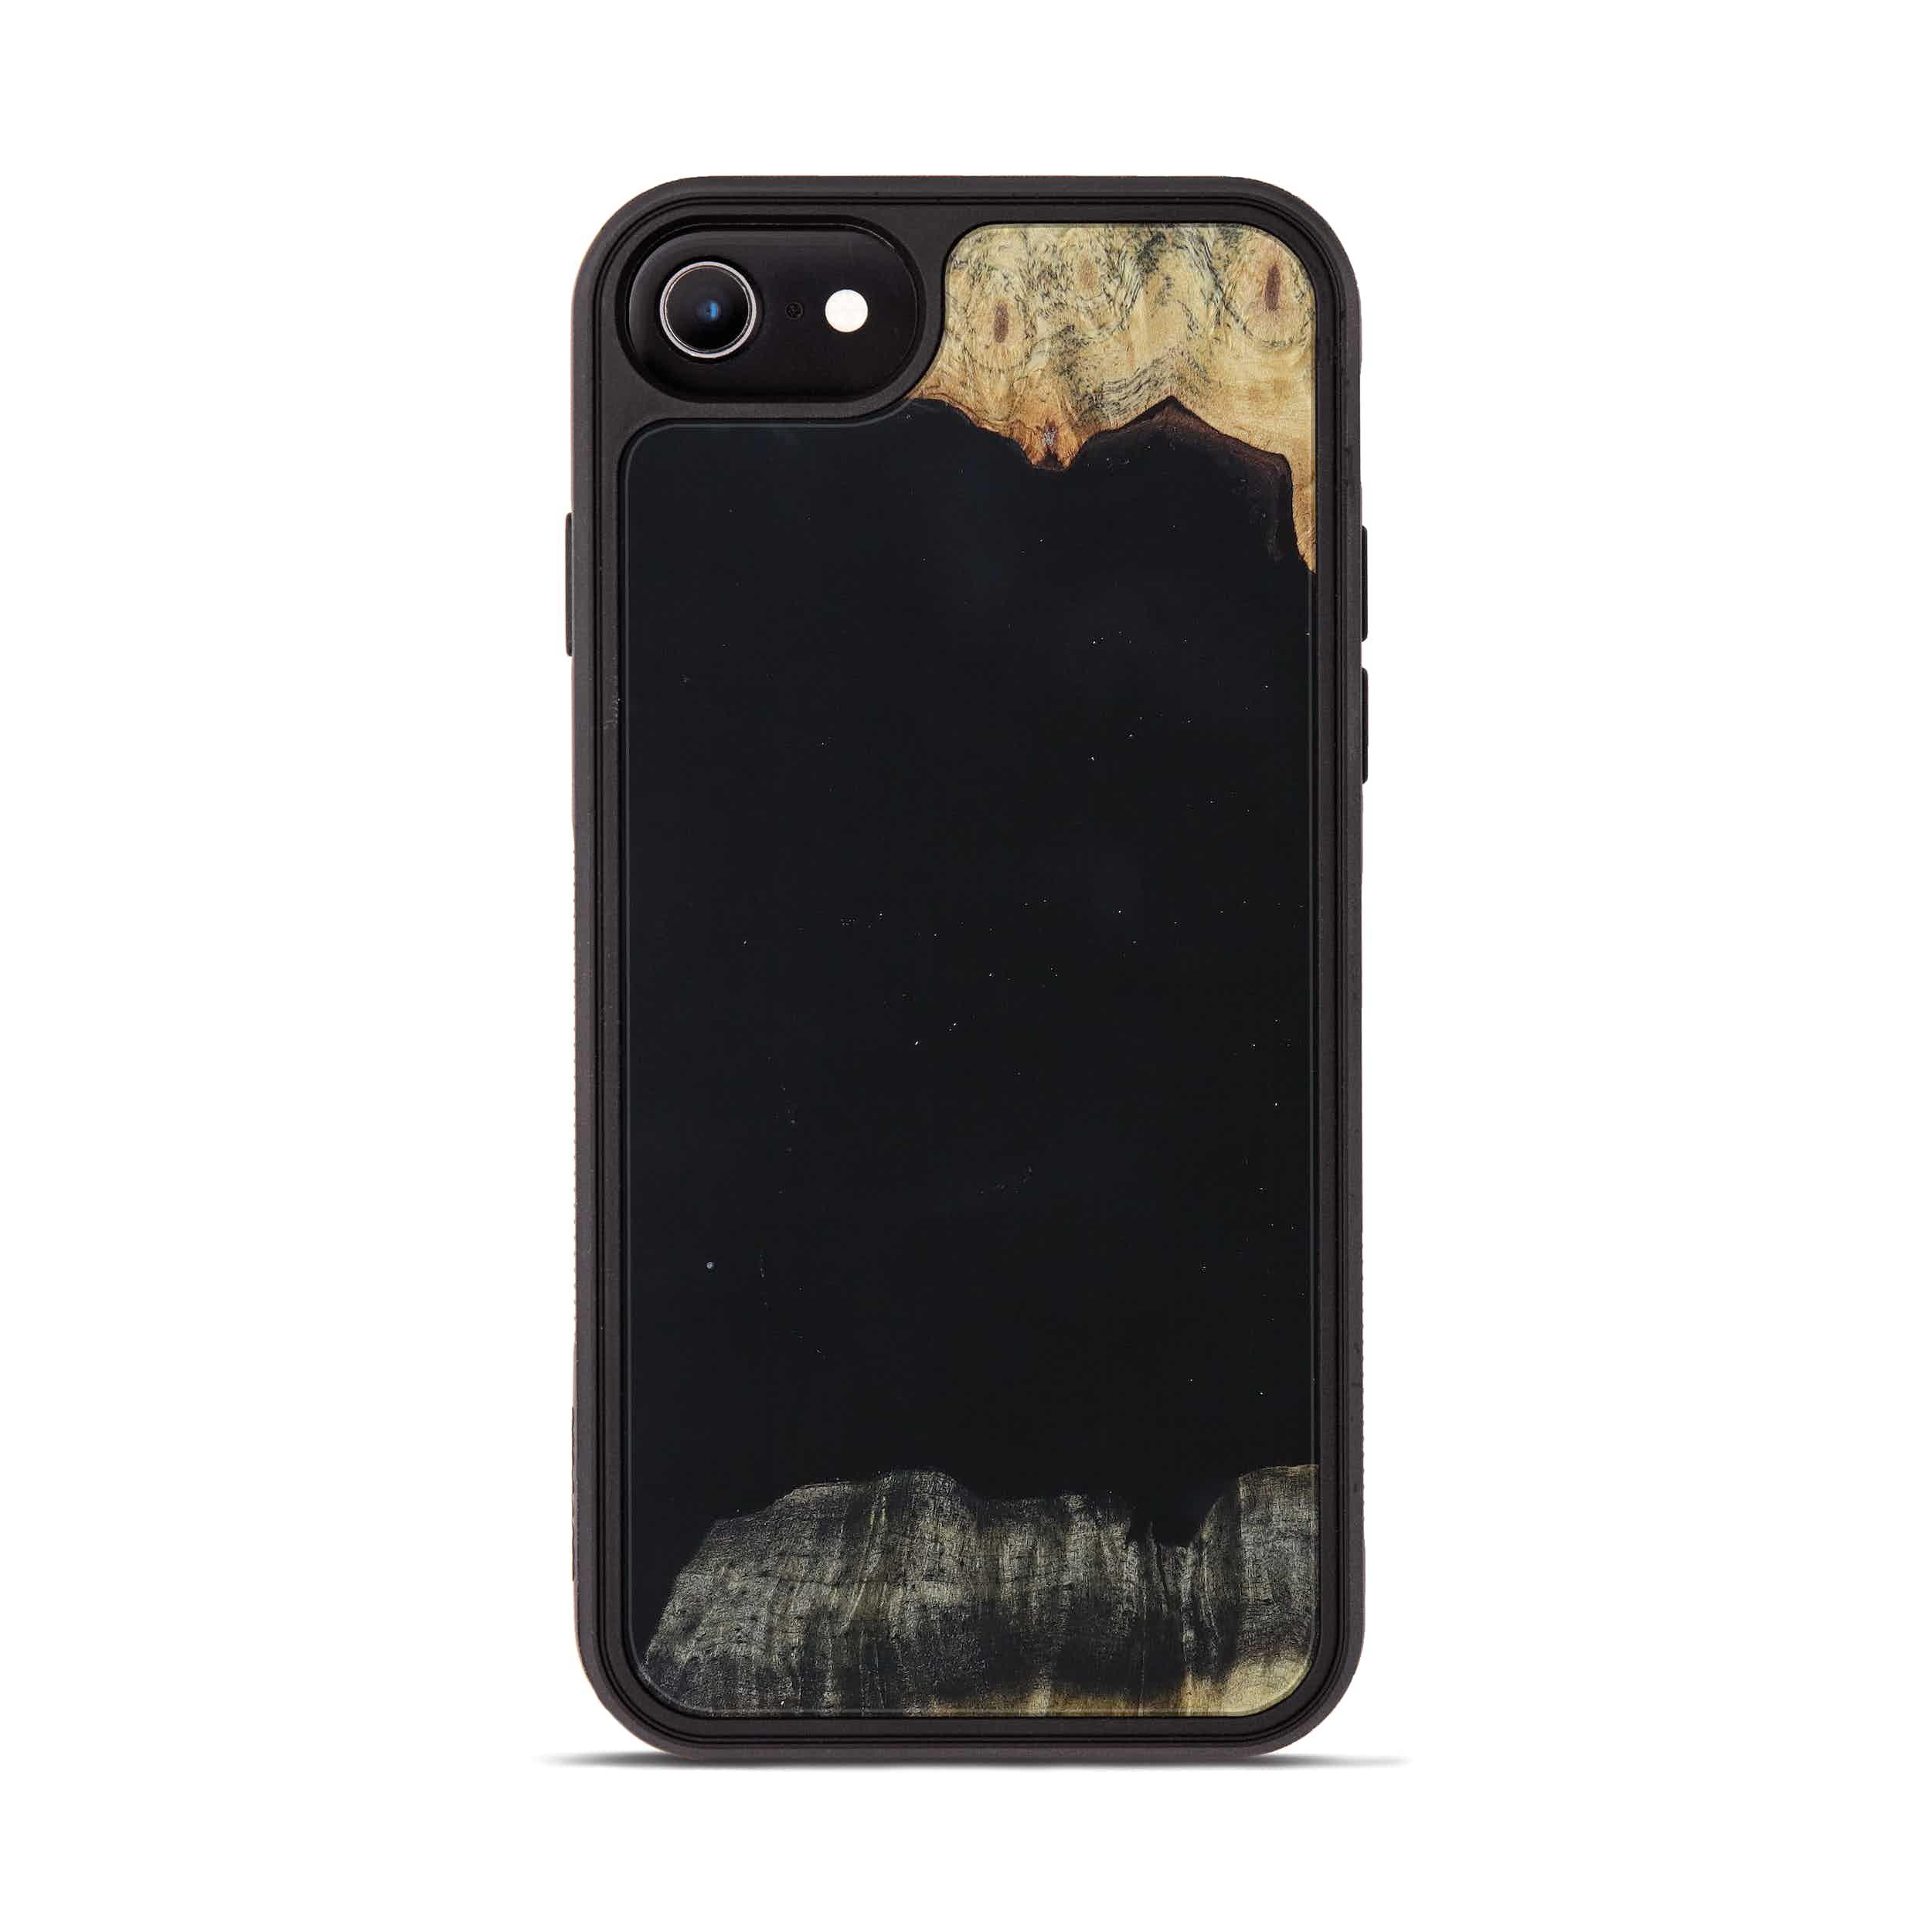 iPhone 6s Wood+Resin Phone Case - Jennine (Pure Black, 395891)